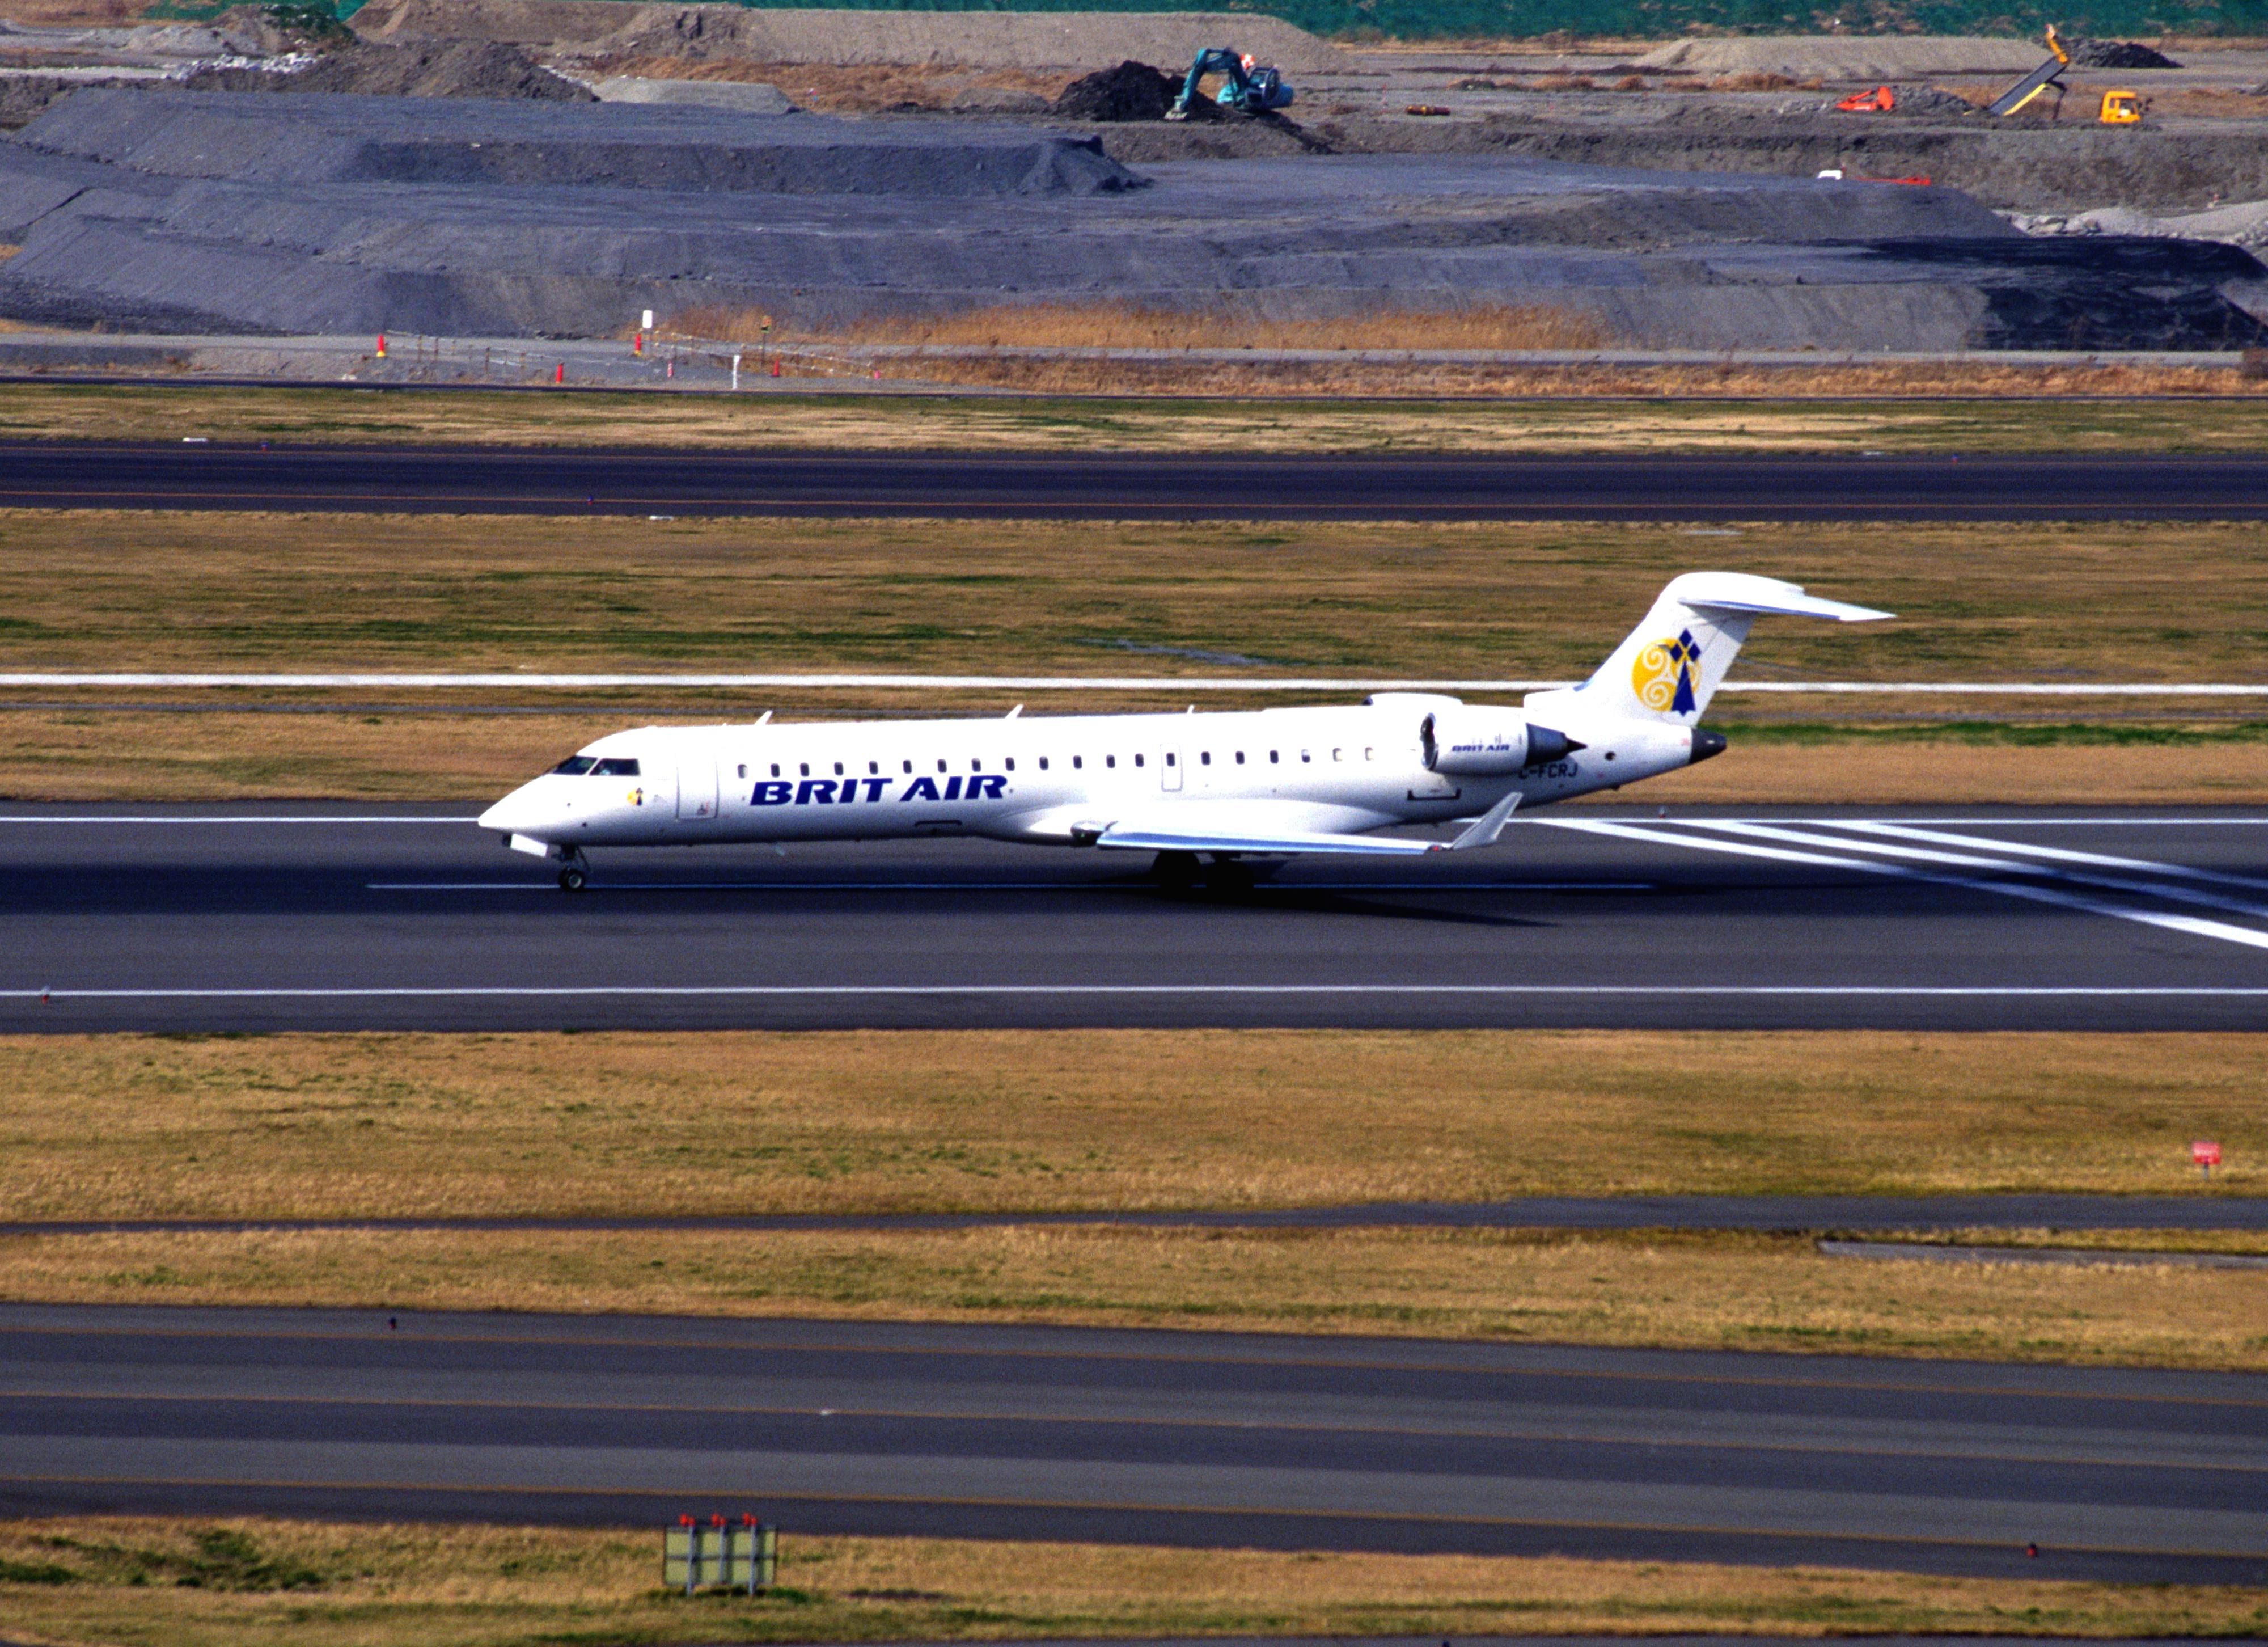 FileBRIT AIR Bombardier CRJ100 C FCRJ 7001 4581391588